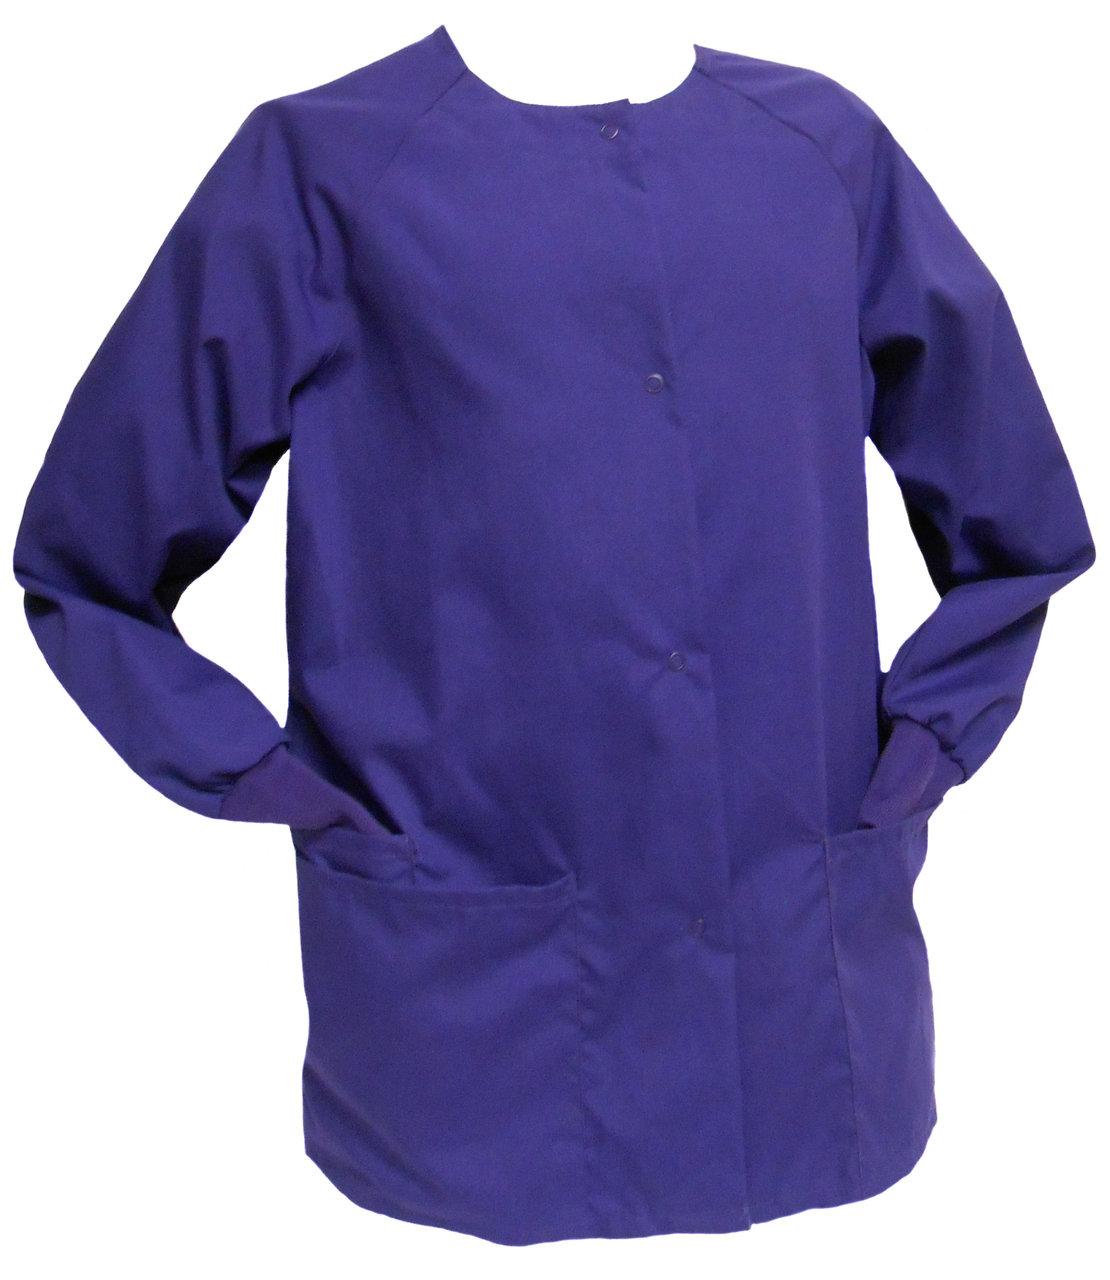 Purple Scrub Jacket. Sizes XS - 5XL | Butler Community College